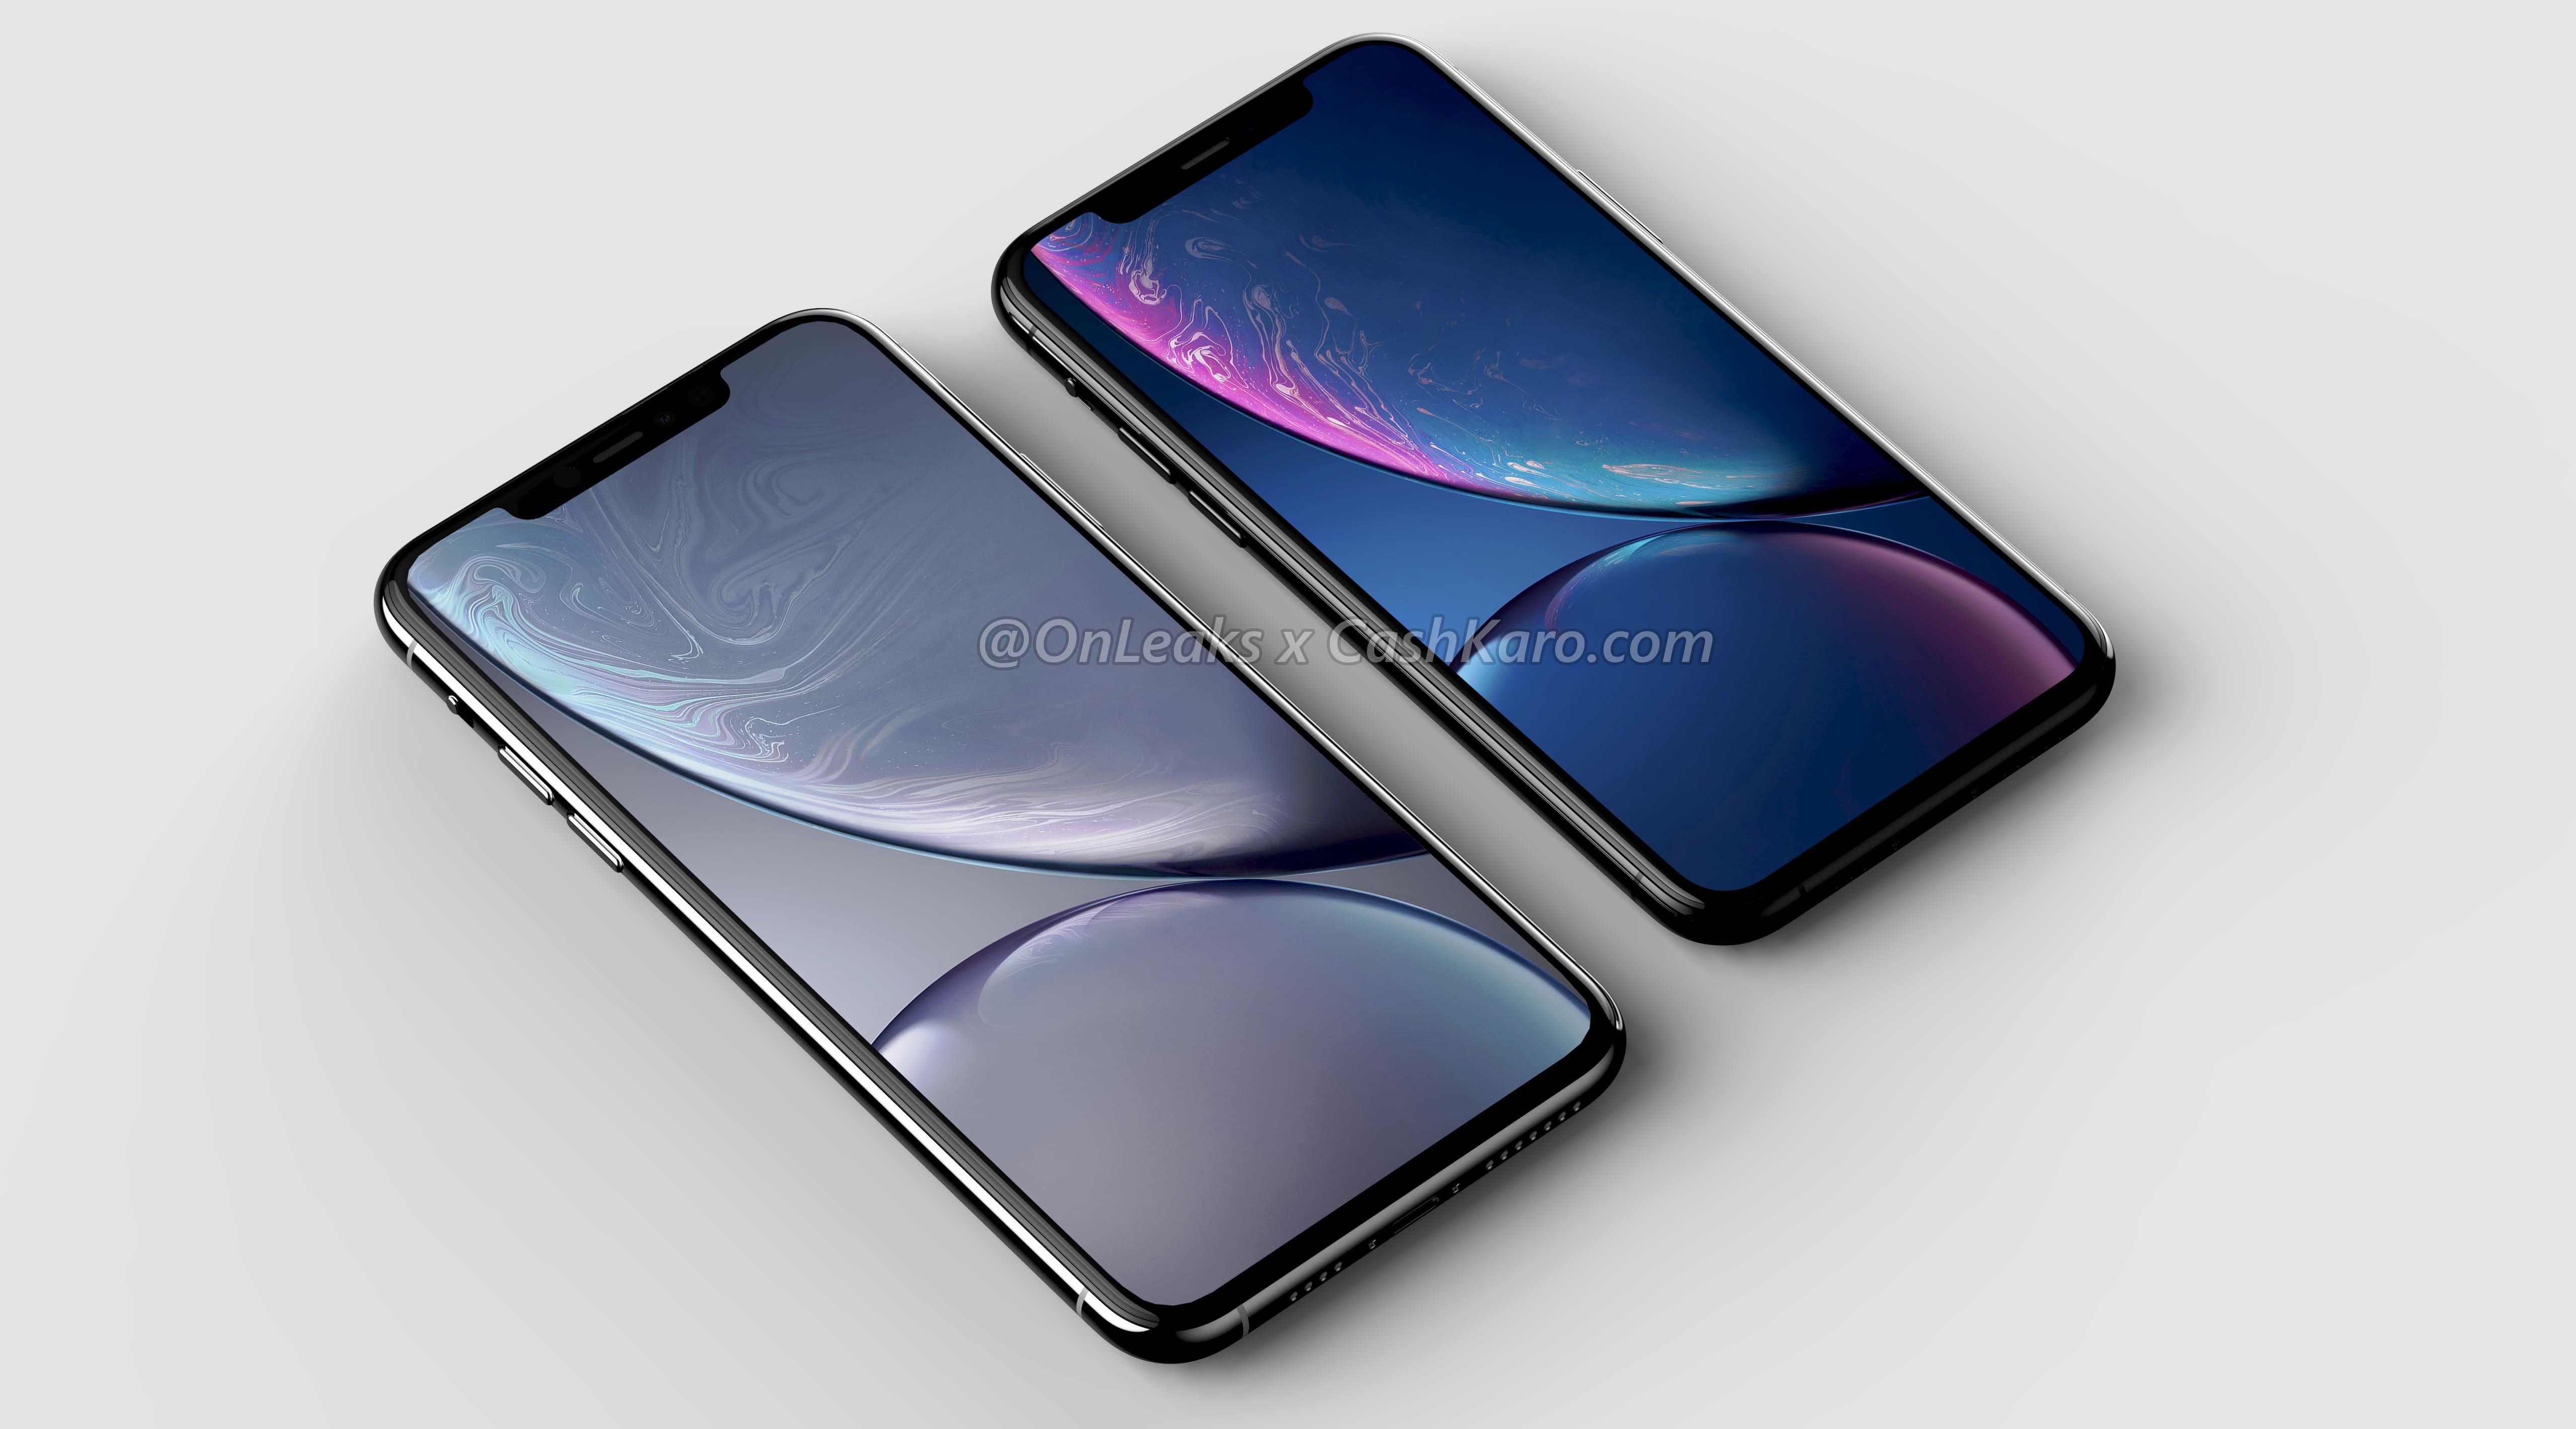 iPhone-XI-vs-iPhone-XI-Max-5K2-min